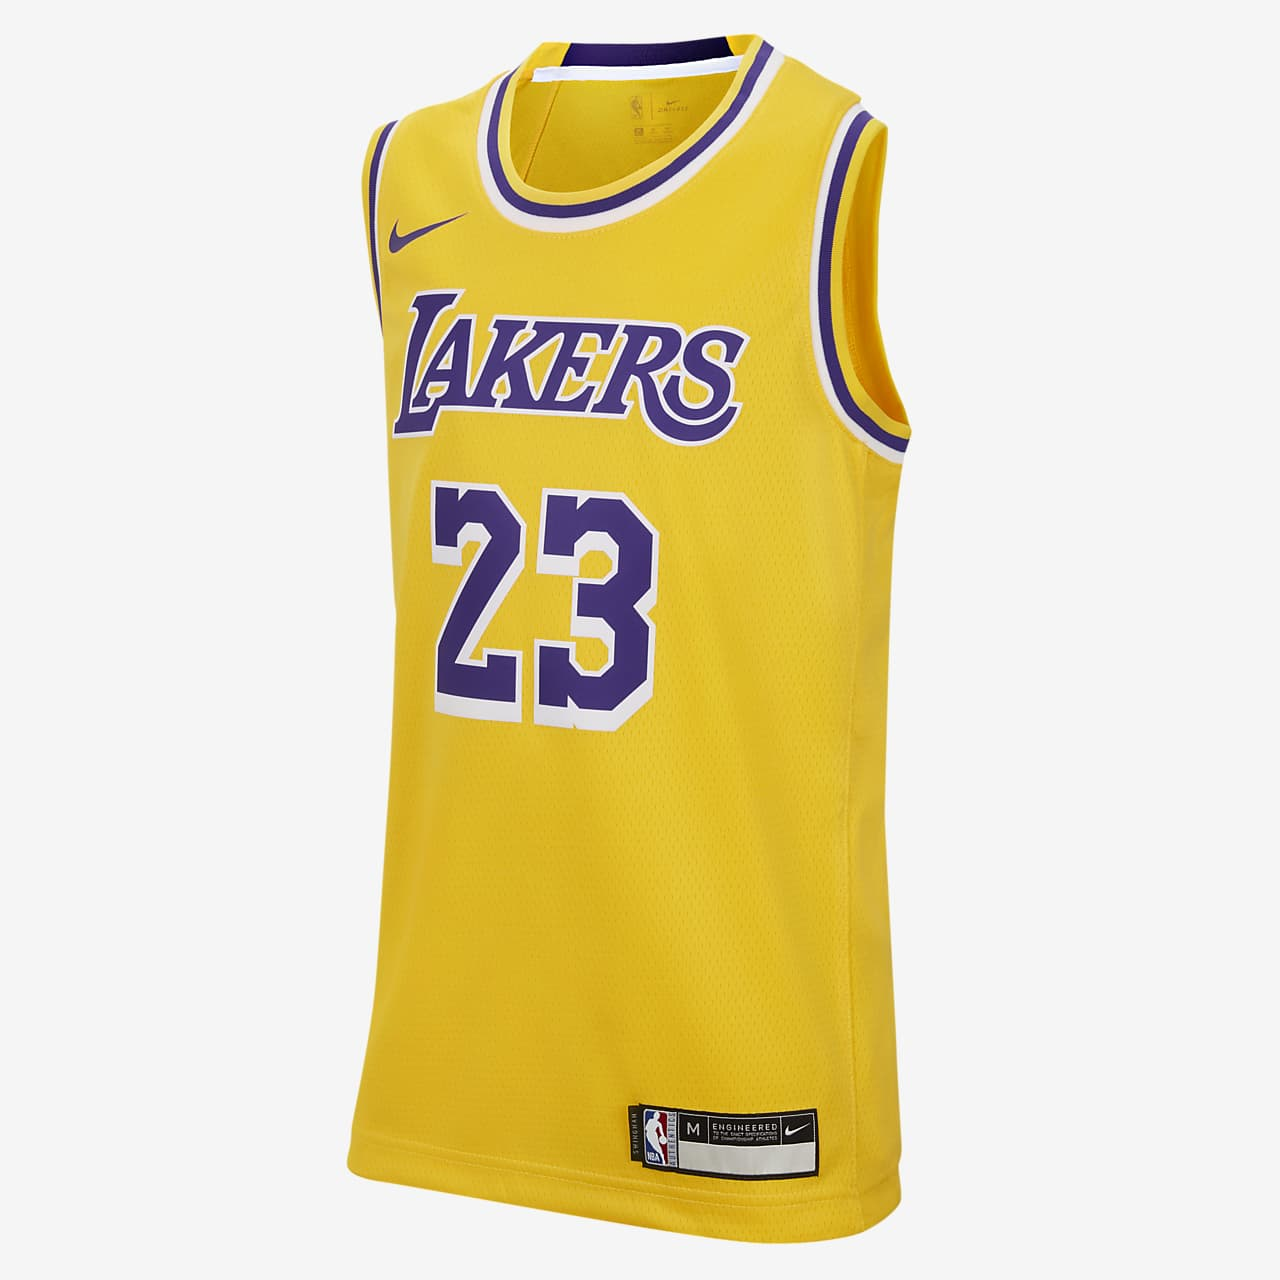 Nike NBA-tröja Icon Edition Swingman Jersey (Los Angeles Lakers) Nike för ungdom